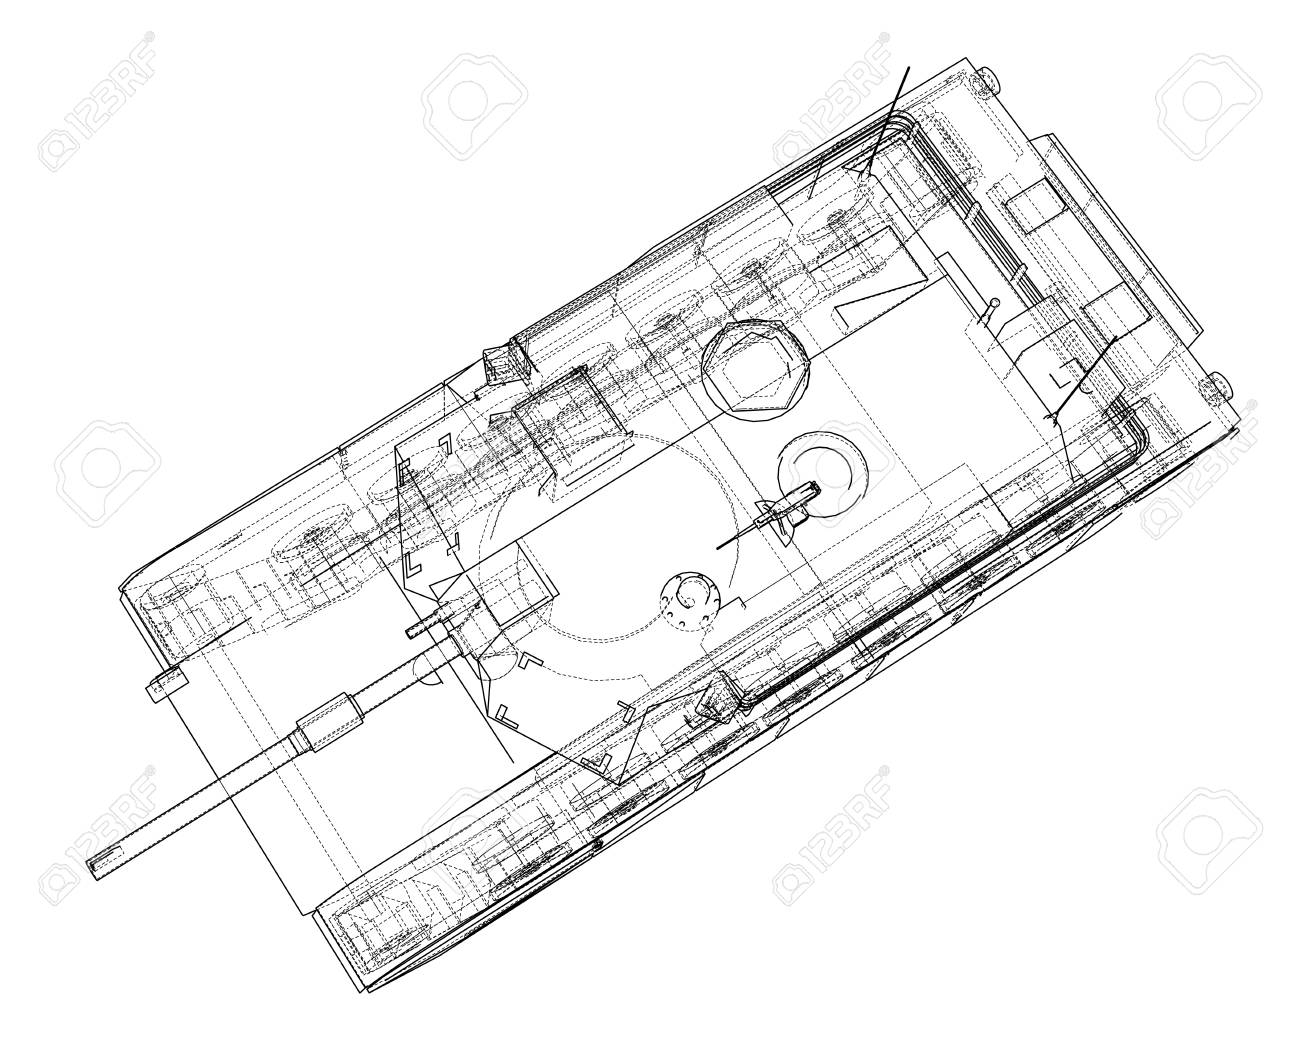 Blueprint Of Realistic Tank Vector Eps10 Format Rendering Of